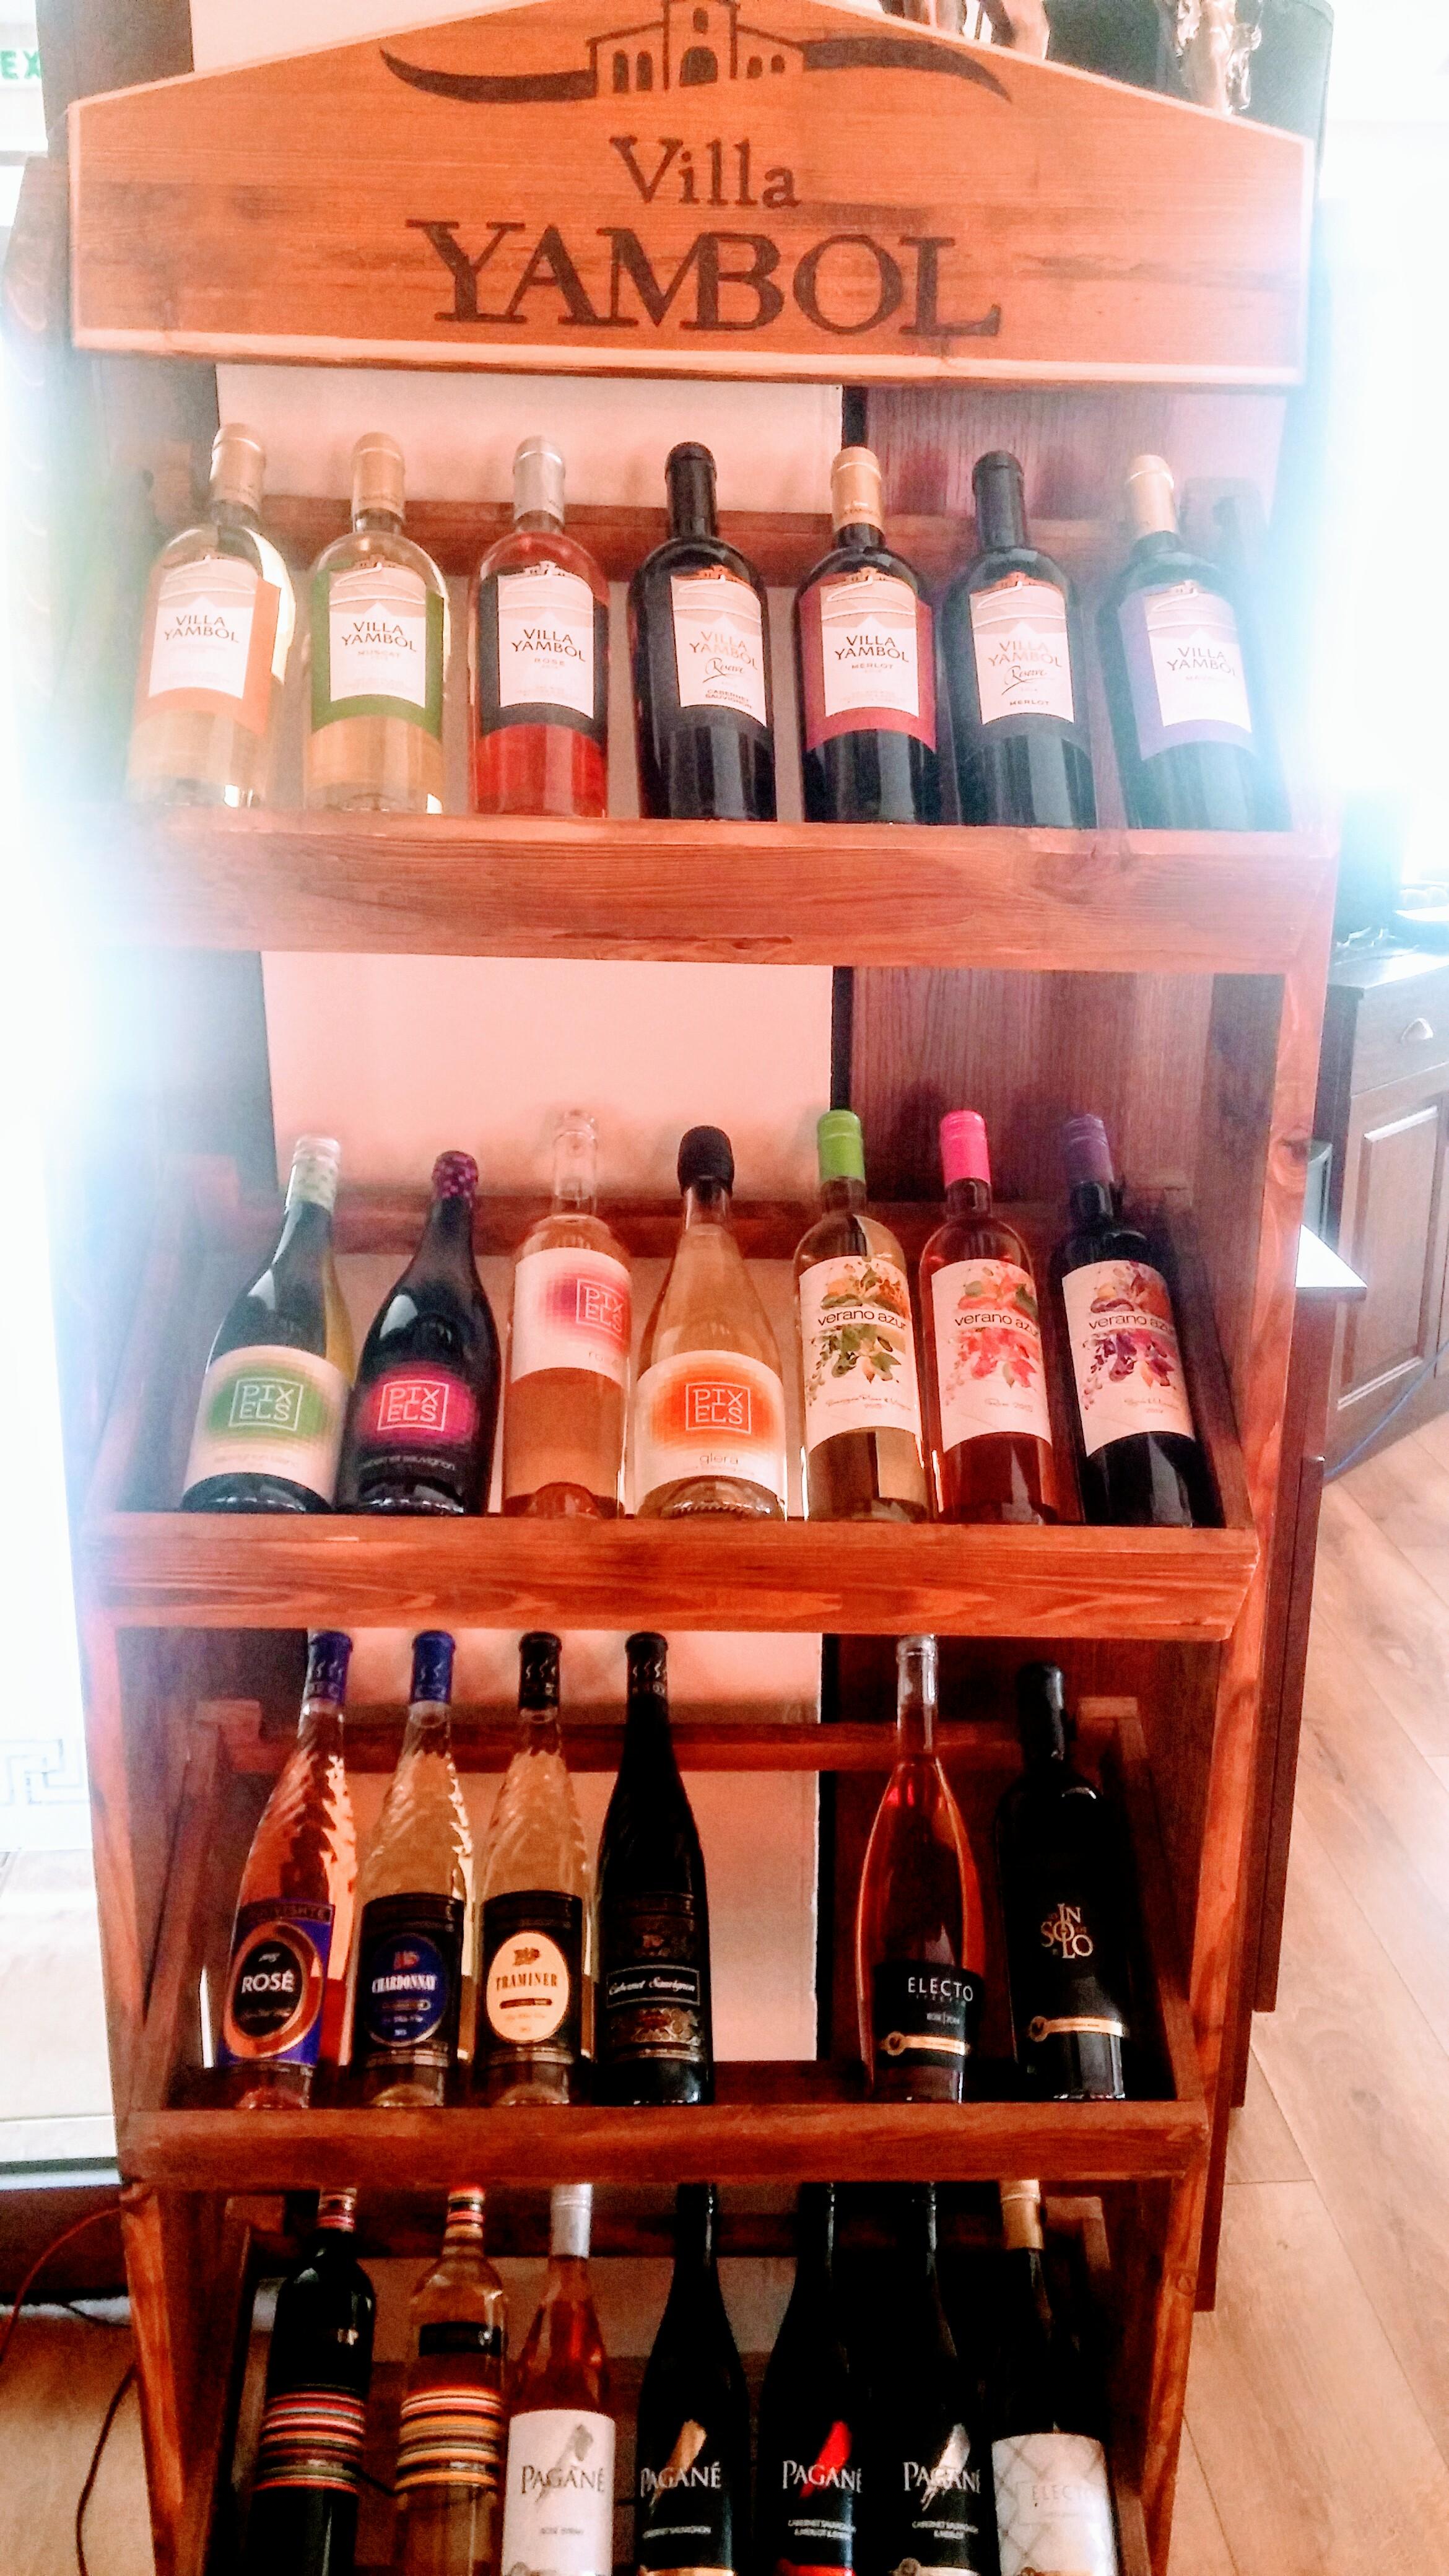 вино Болгарии, болгарское вино, Ямбол, Траките